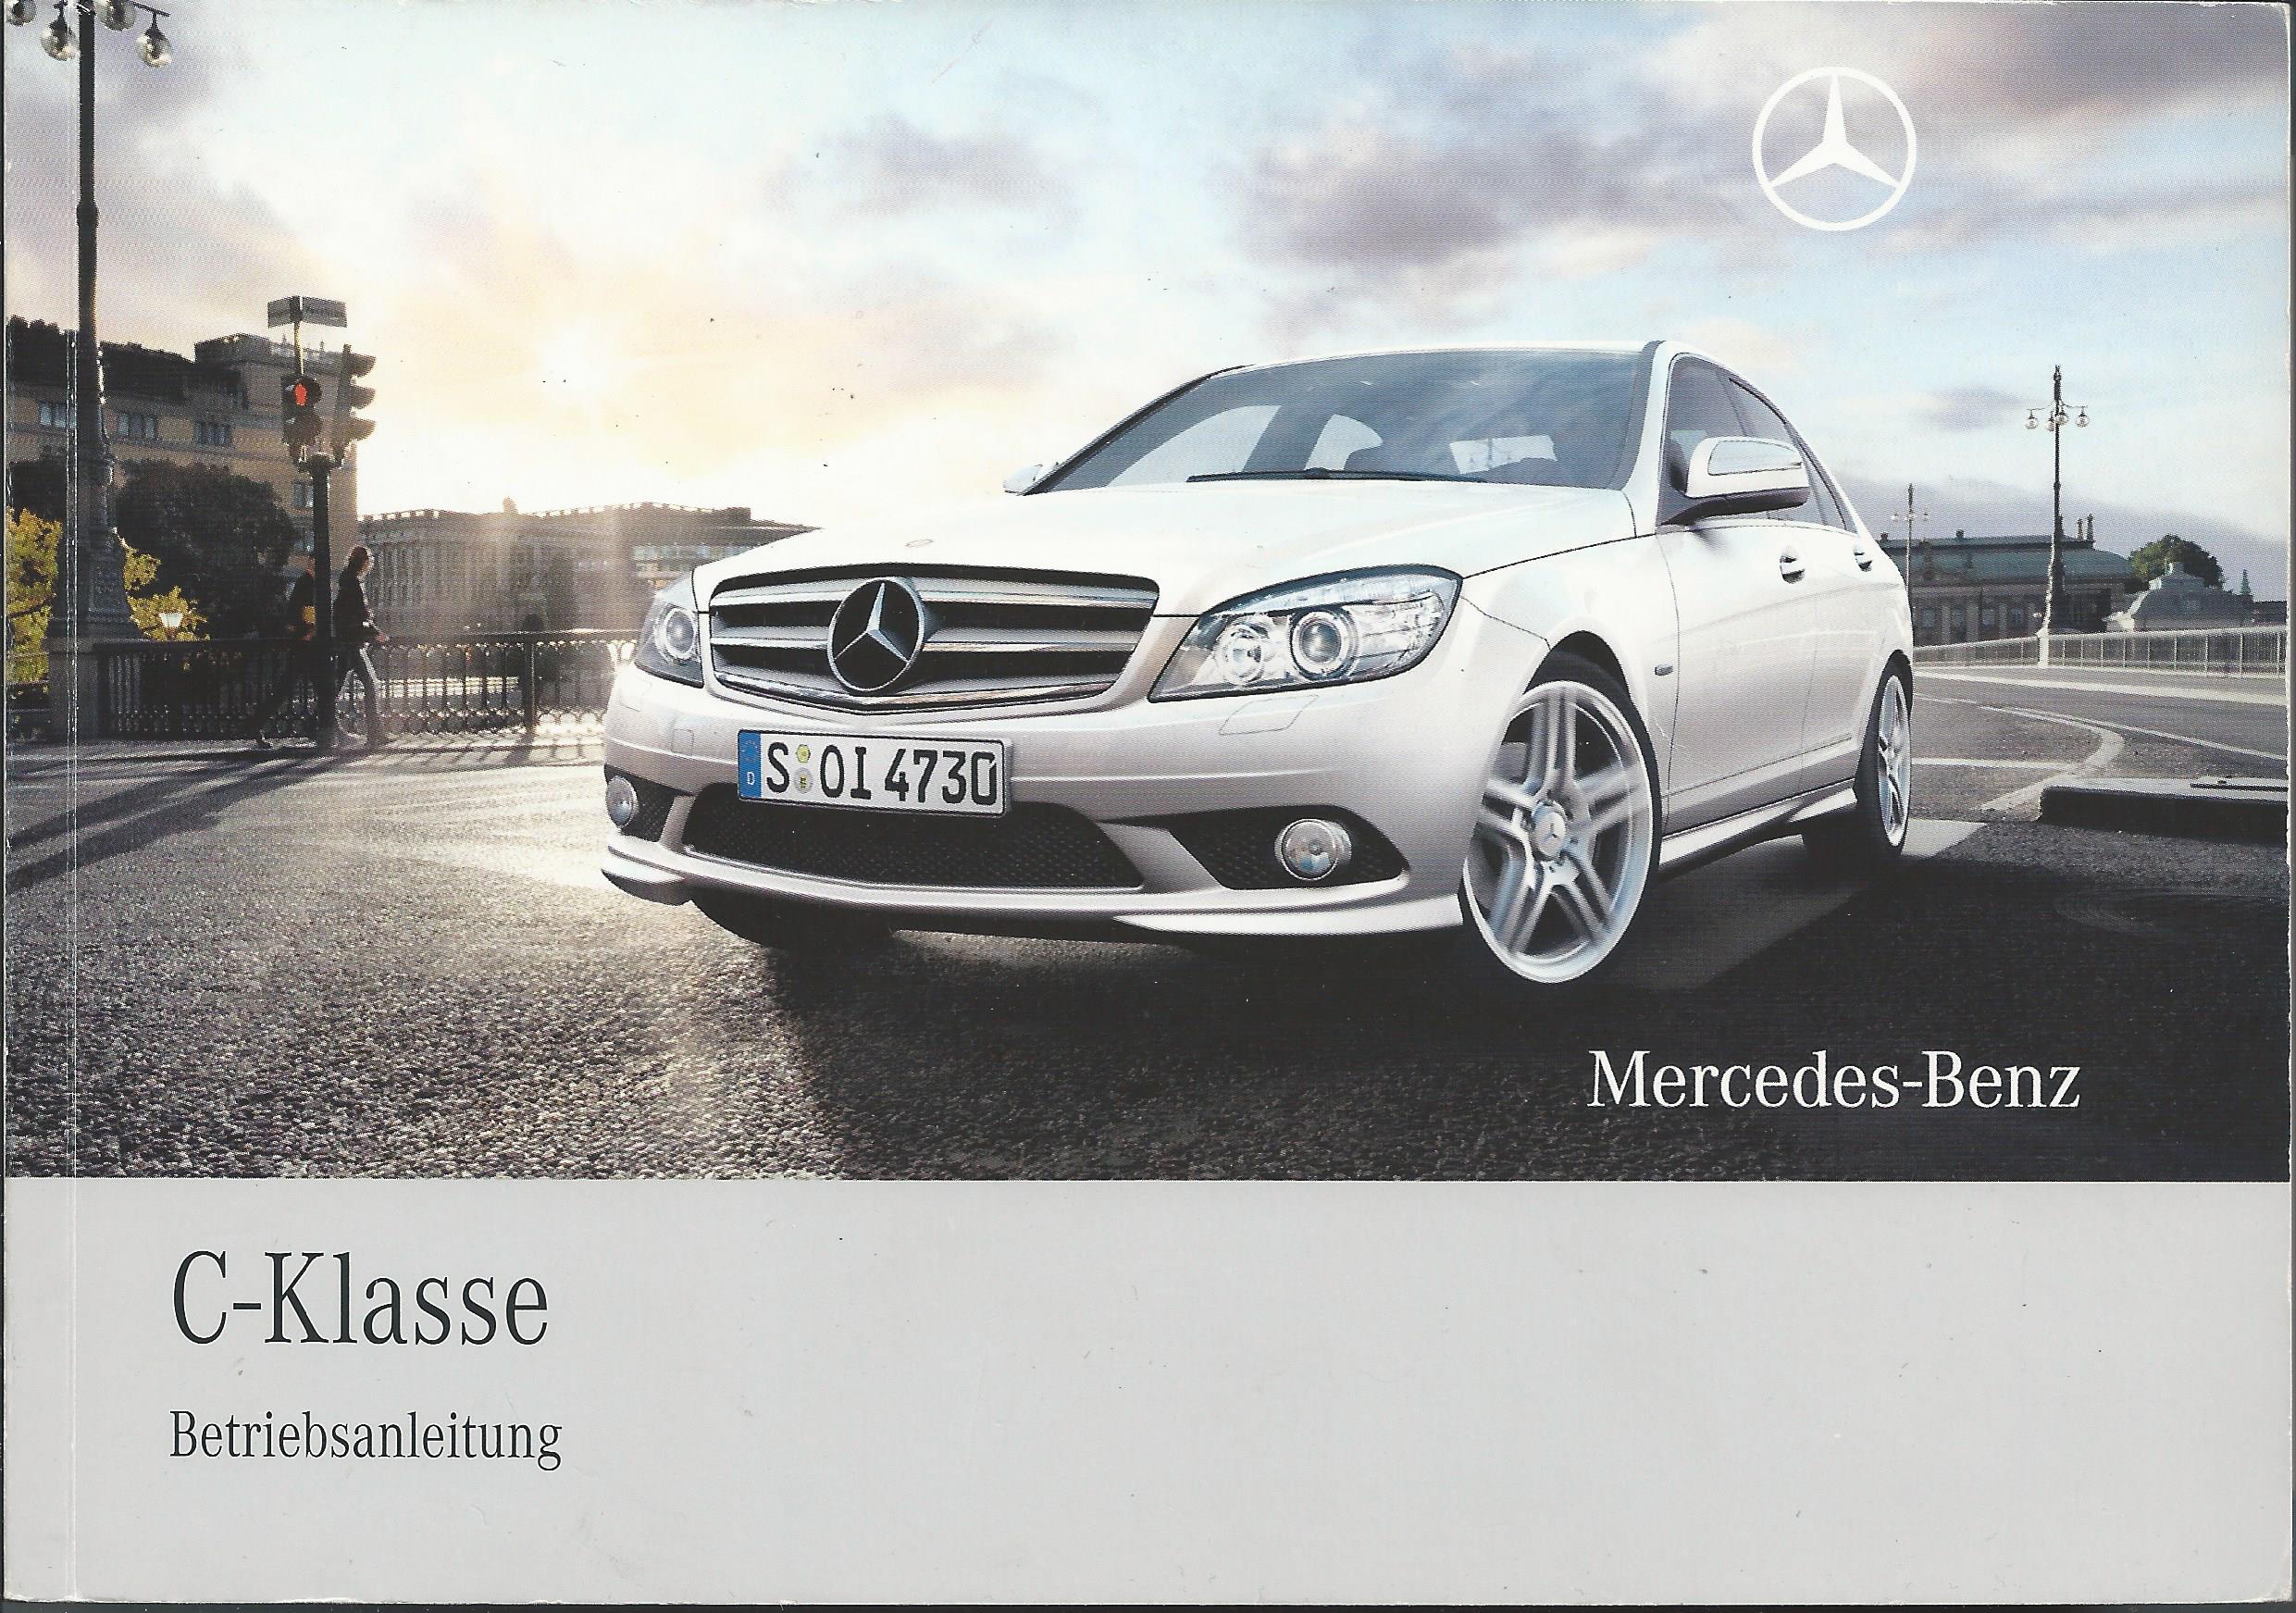 Mercedes Benz W204 C-Klasse Betriebsanleitung 2008 Bordbuch